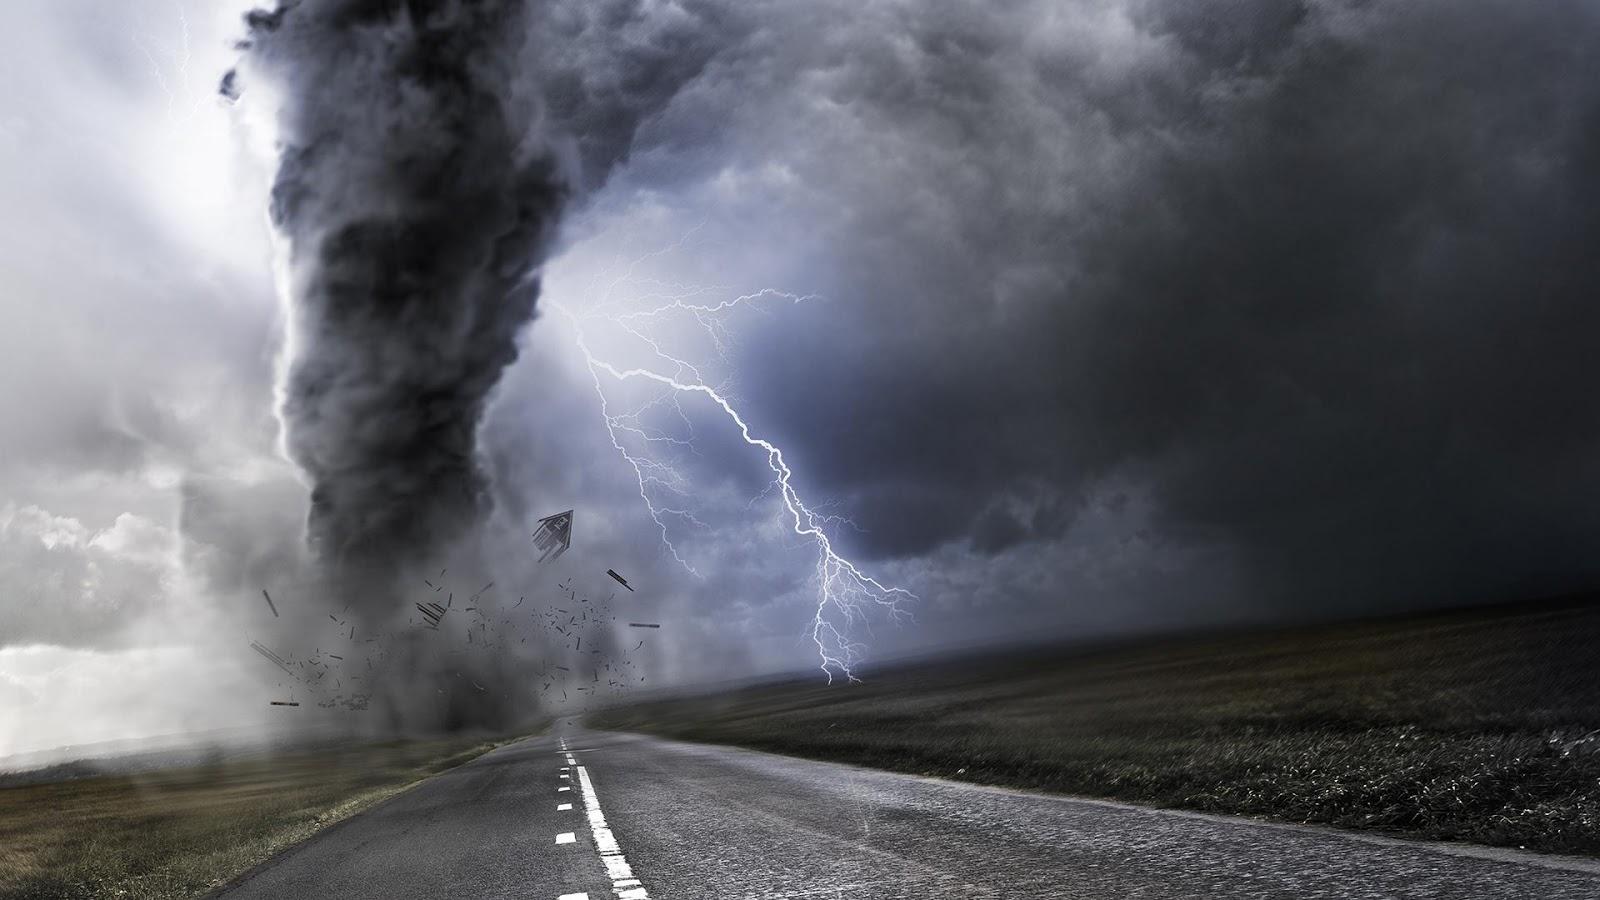 Random images Tornado HD wallpaper and background photos